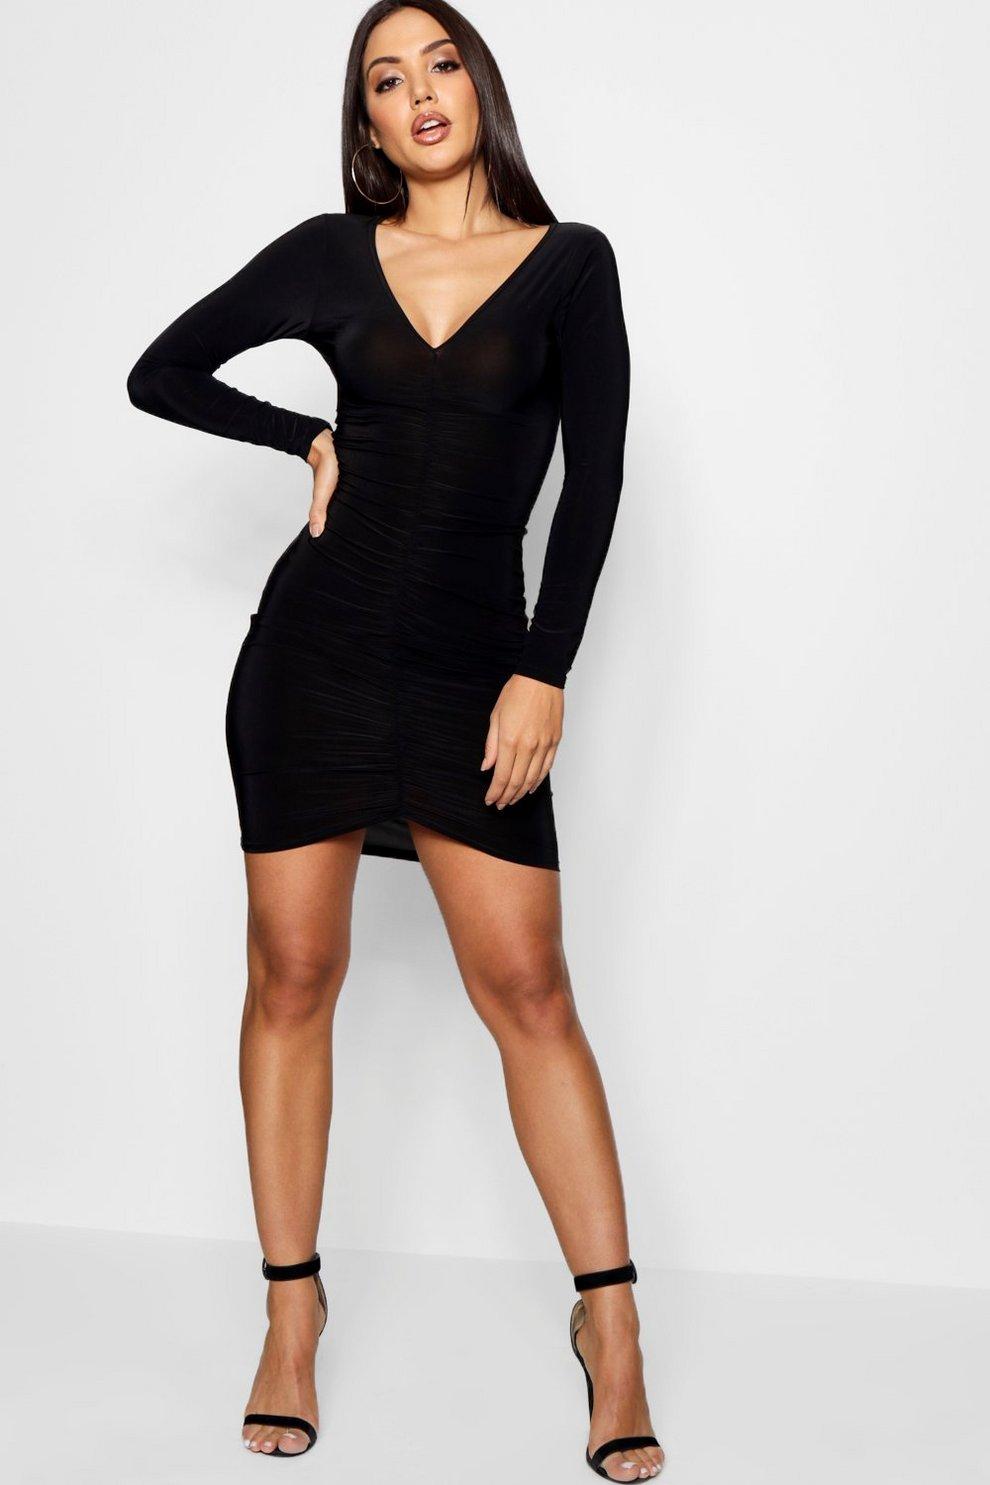 e42d4f65f34b Womens Black Slinky Ruched Long Sleeve Bodycon Dress